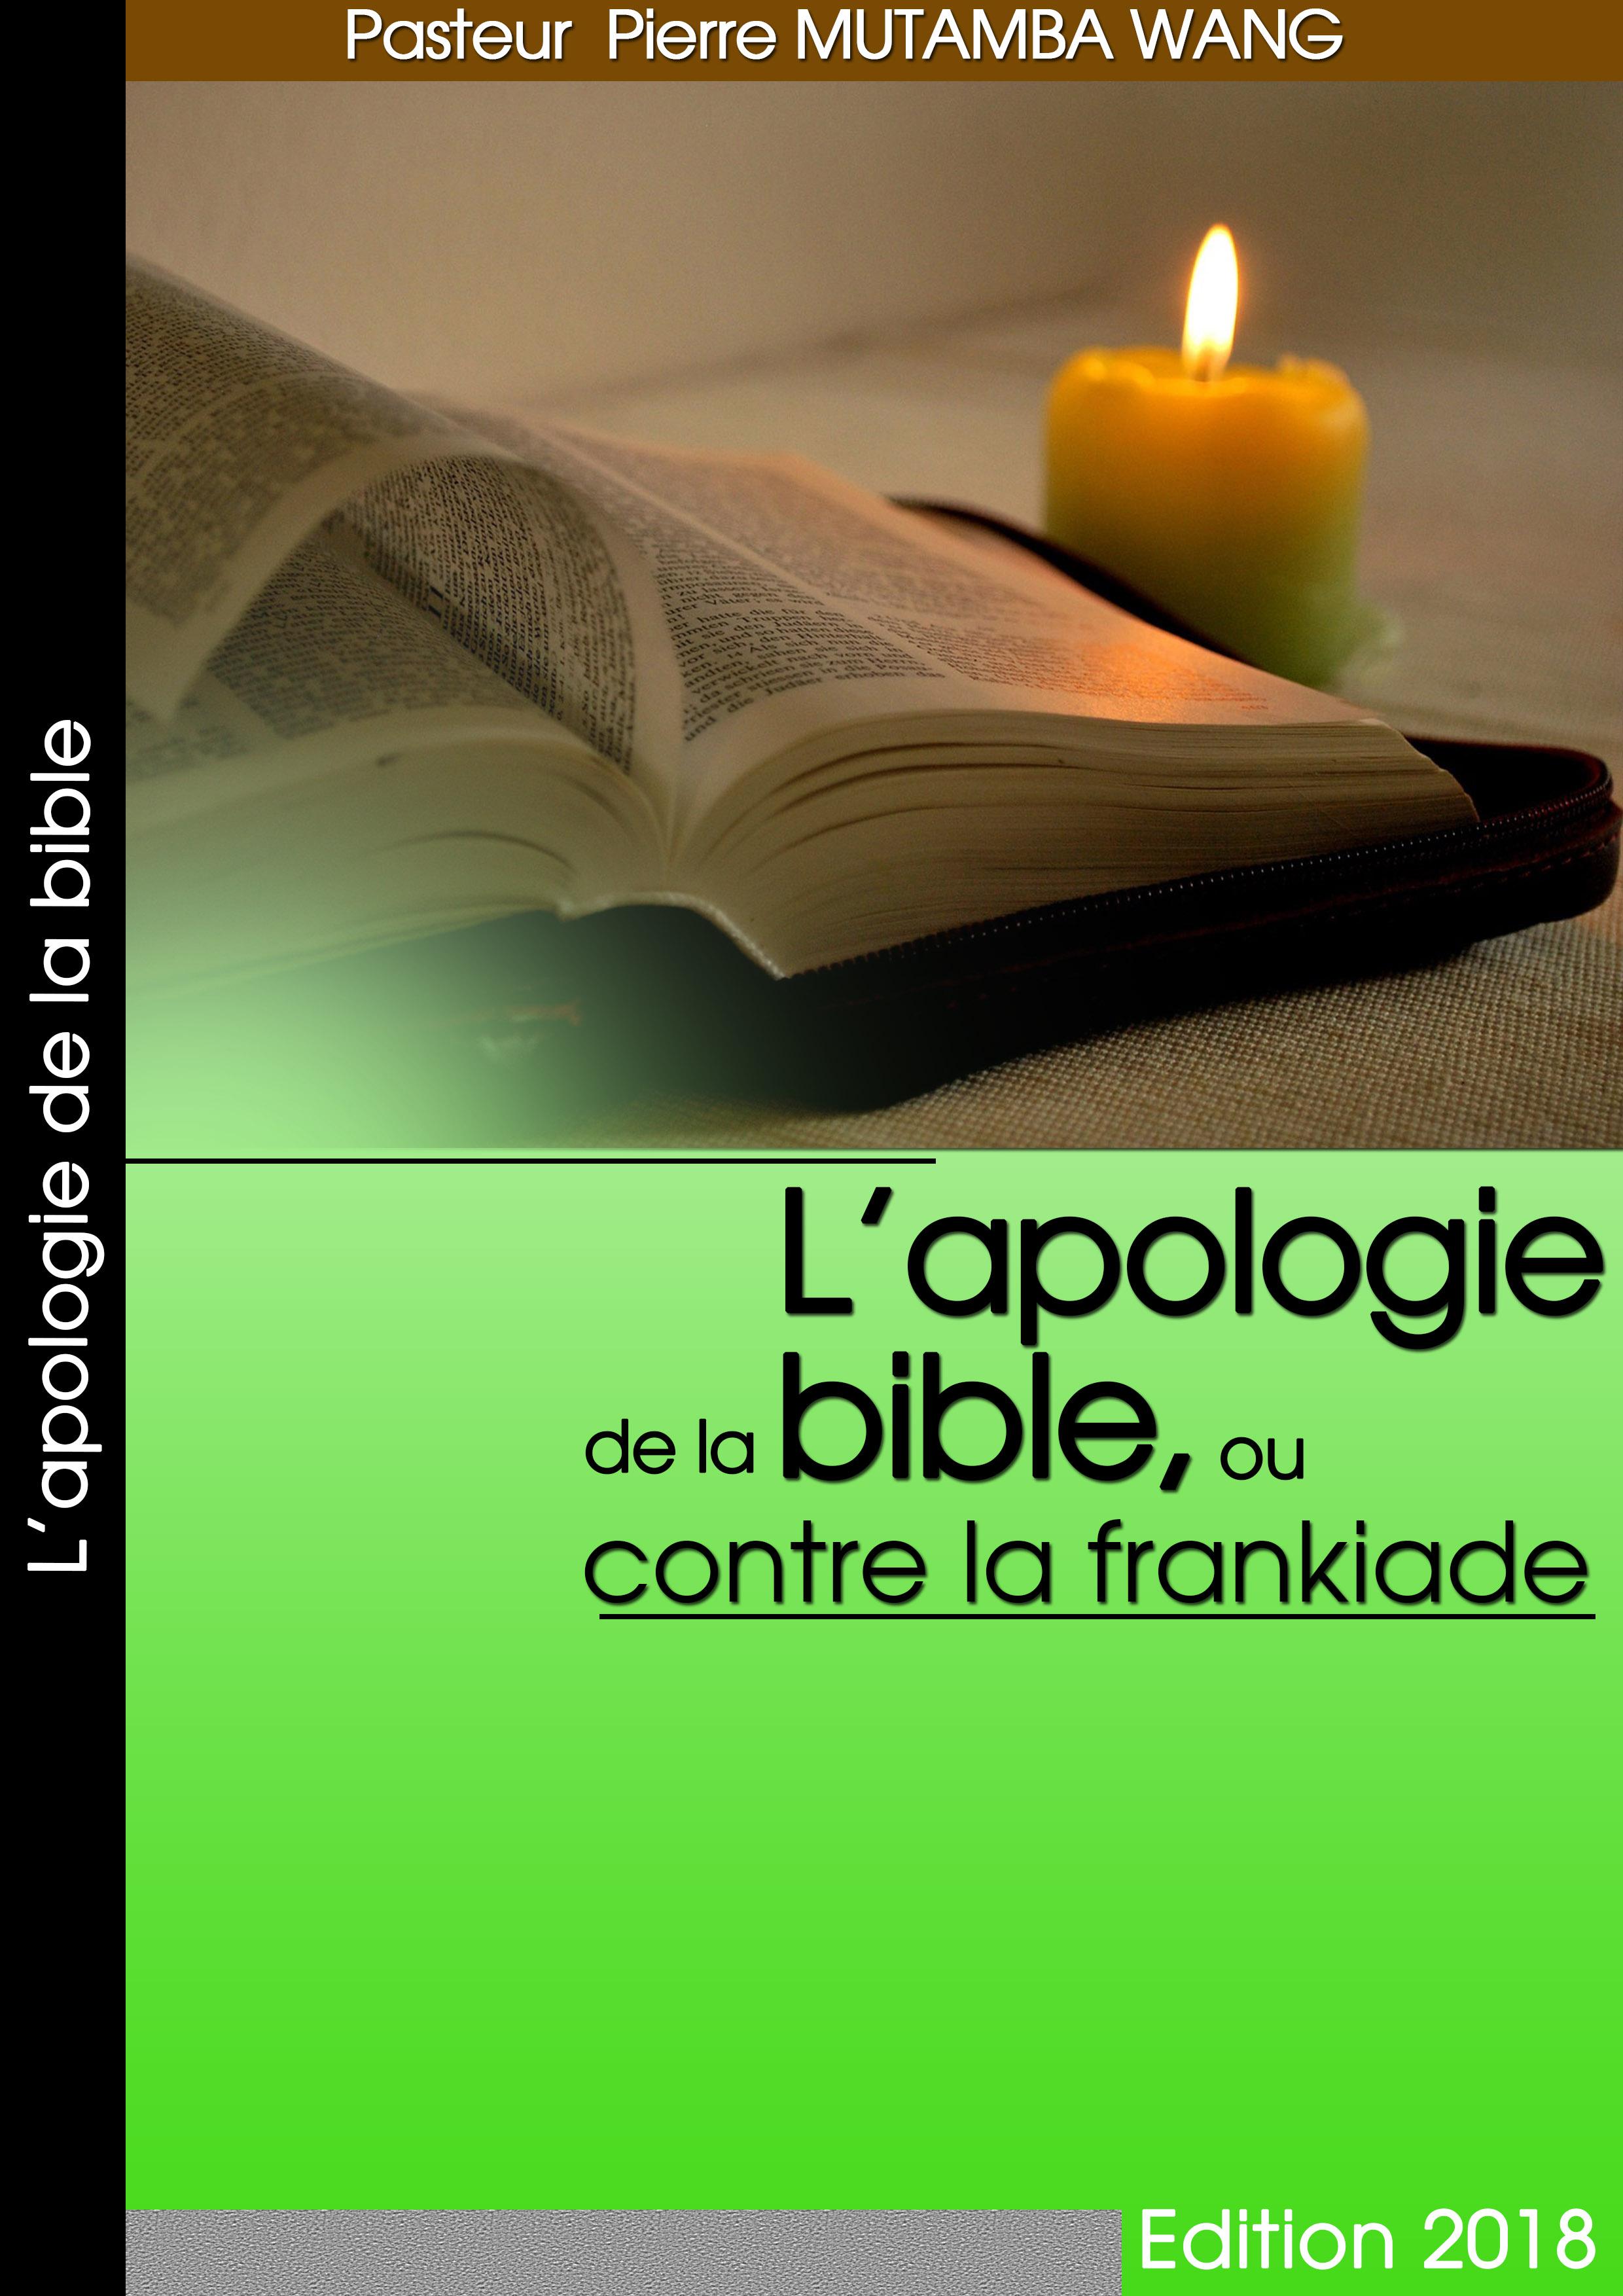 L'APOLOGIE DE LA BIBLE, OU CONTRE LA FRANKIADE